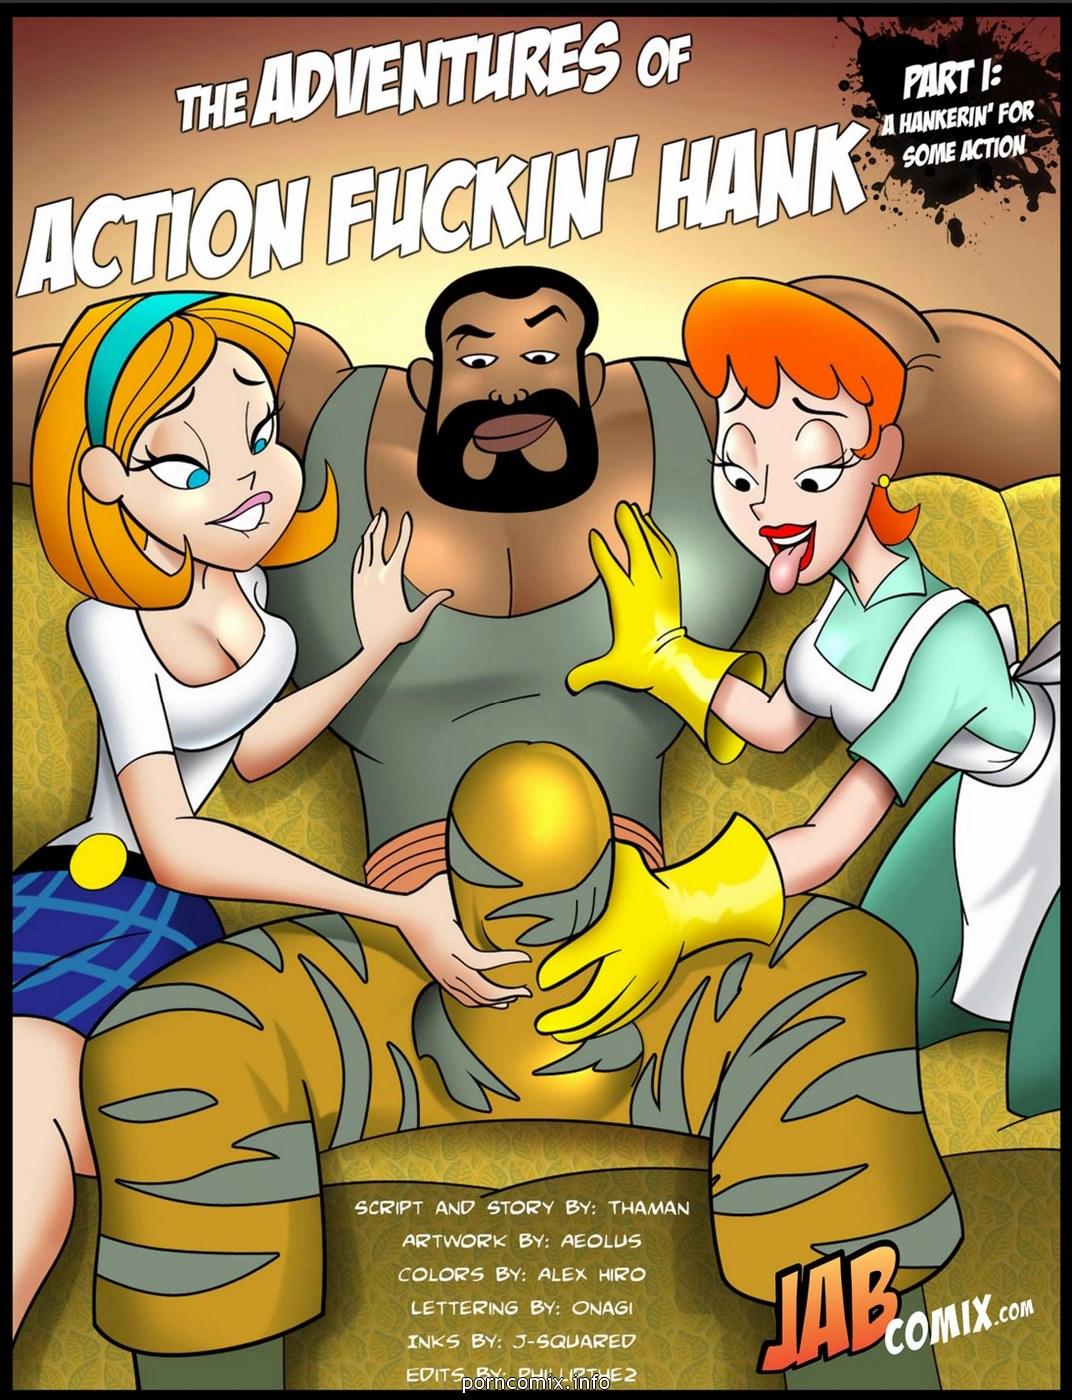 Adventures of Action Fuckin' Hank image 01